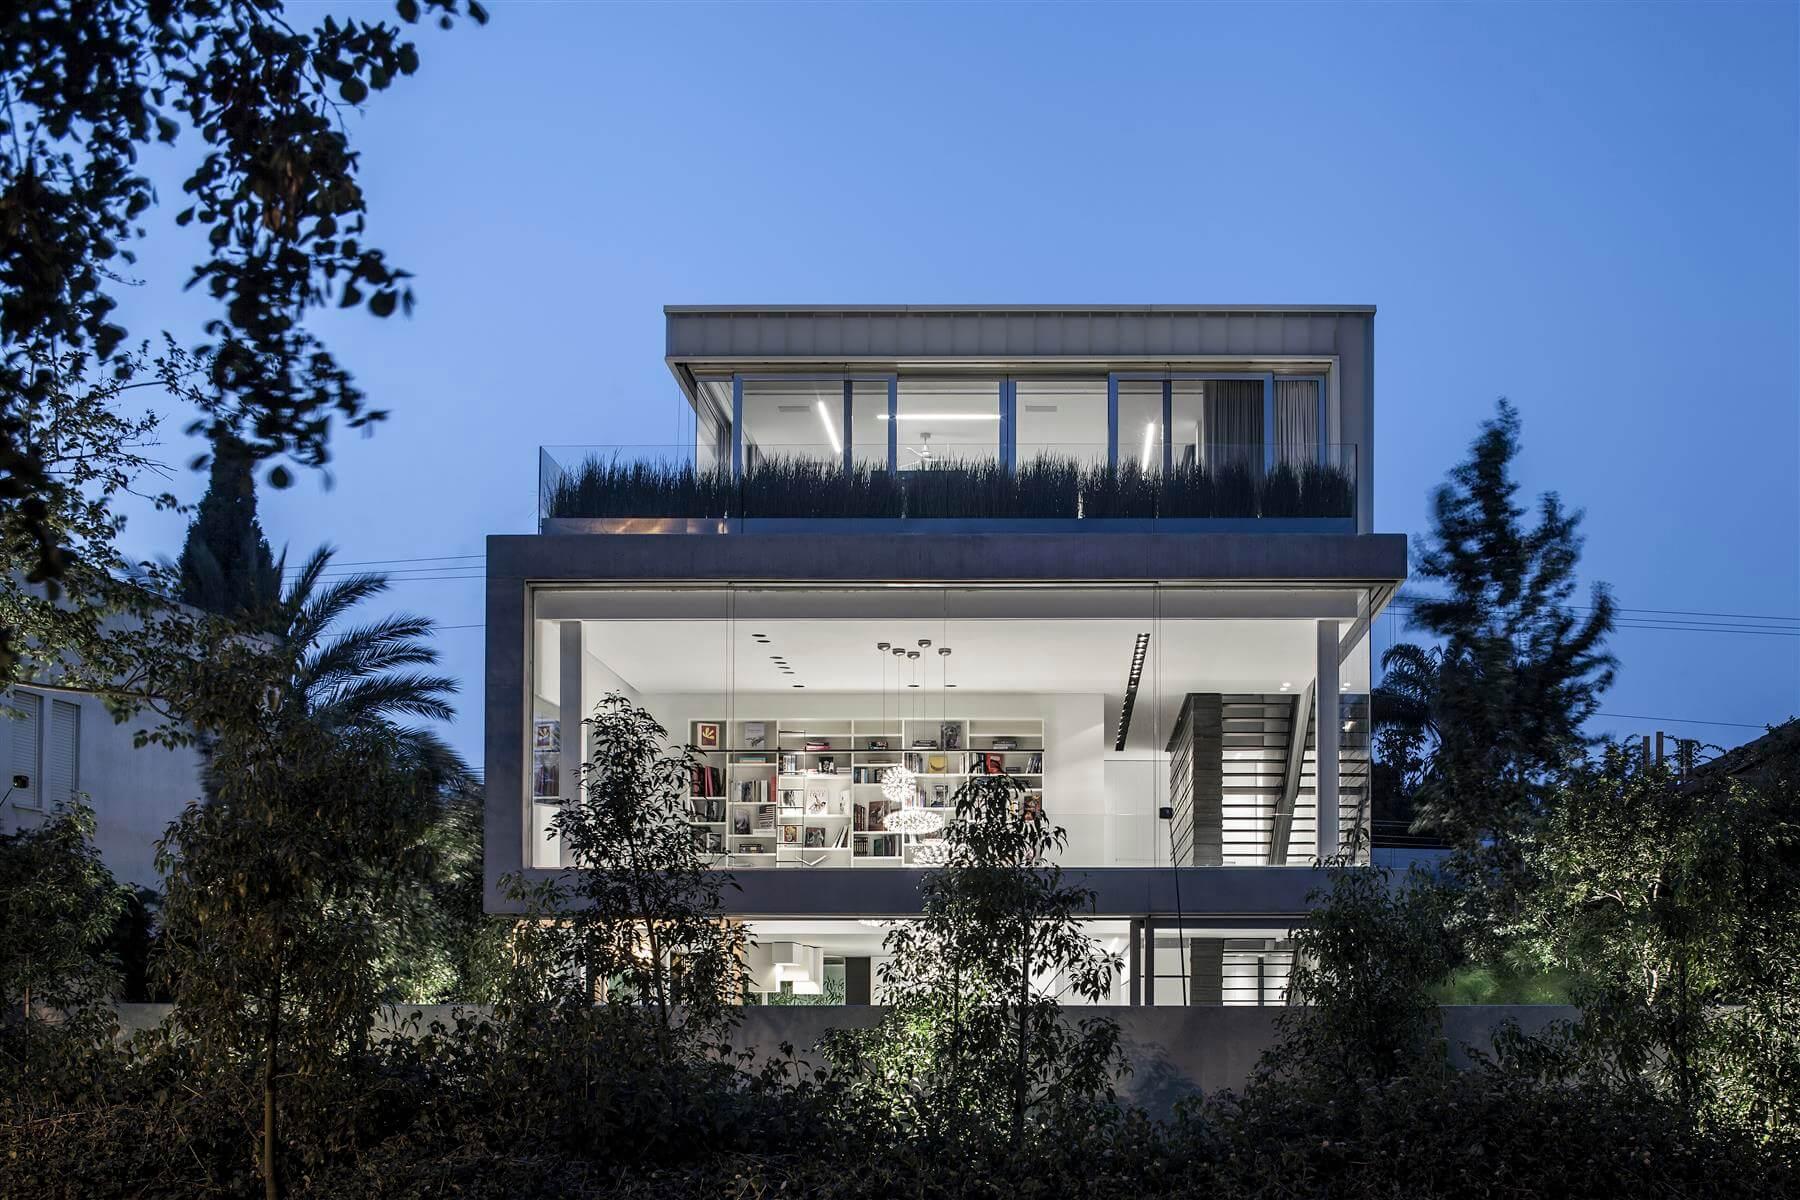 The Concrete Cut House in Ramat Gan by Pitsou Kedem Architects-14